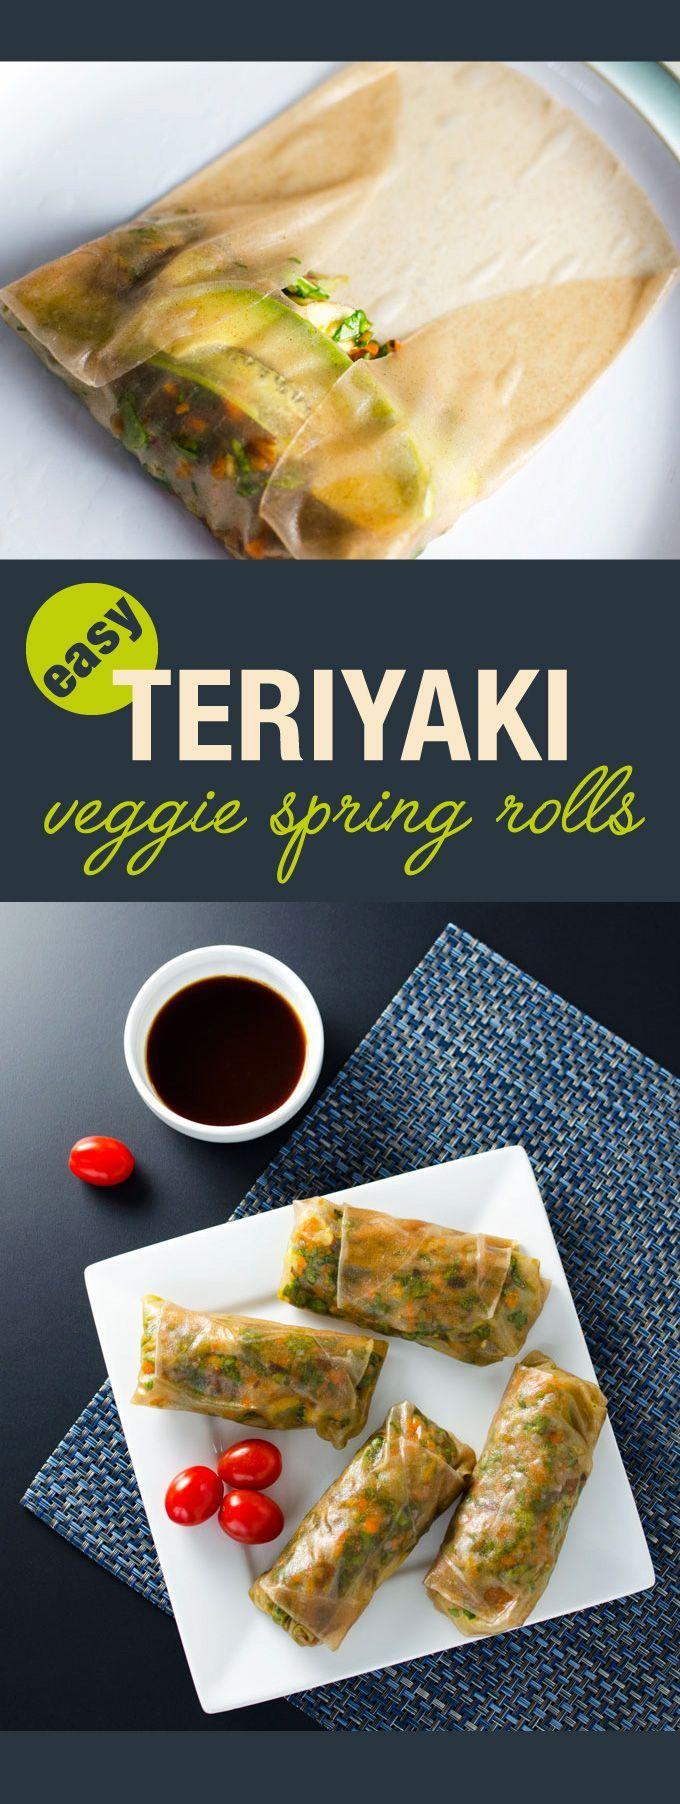 Teriyaki Veggie Spring Rolls - a simple, tasty vegan and gluten free recipe   VeggiePrimer.com